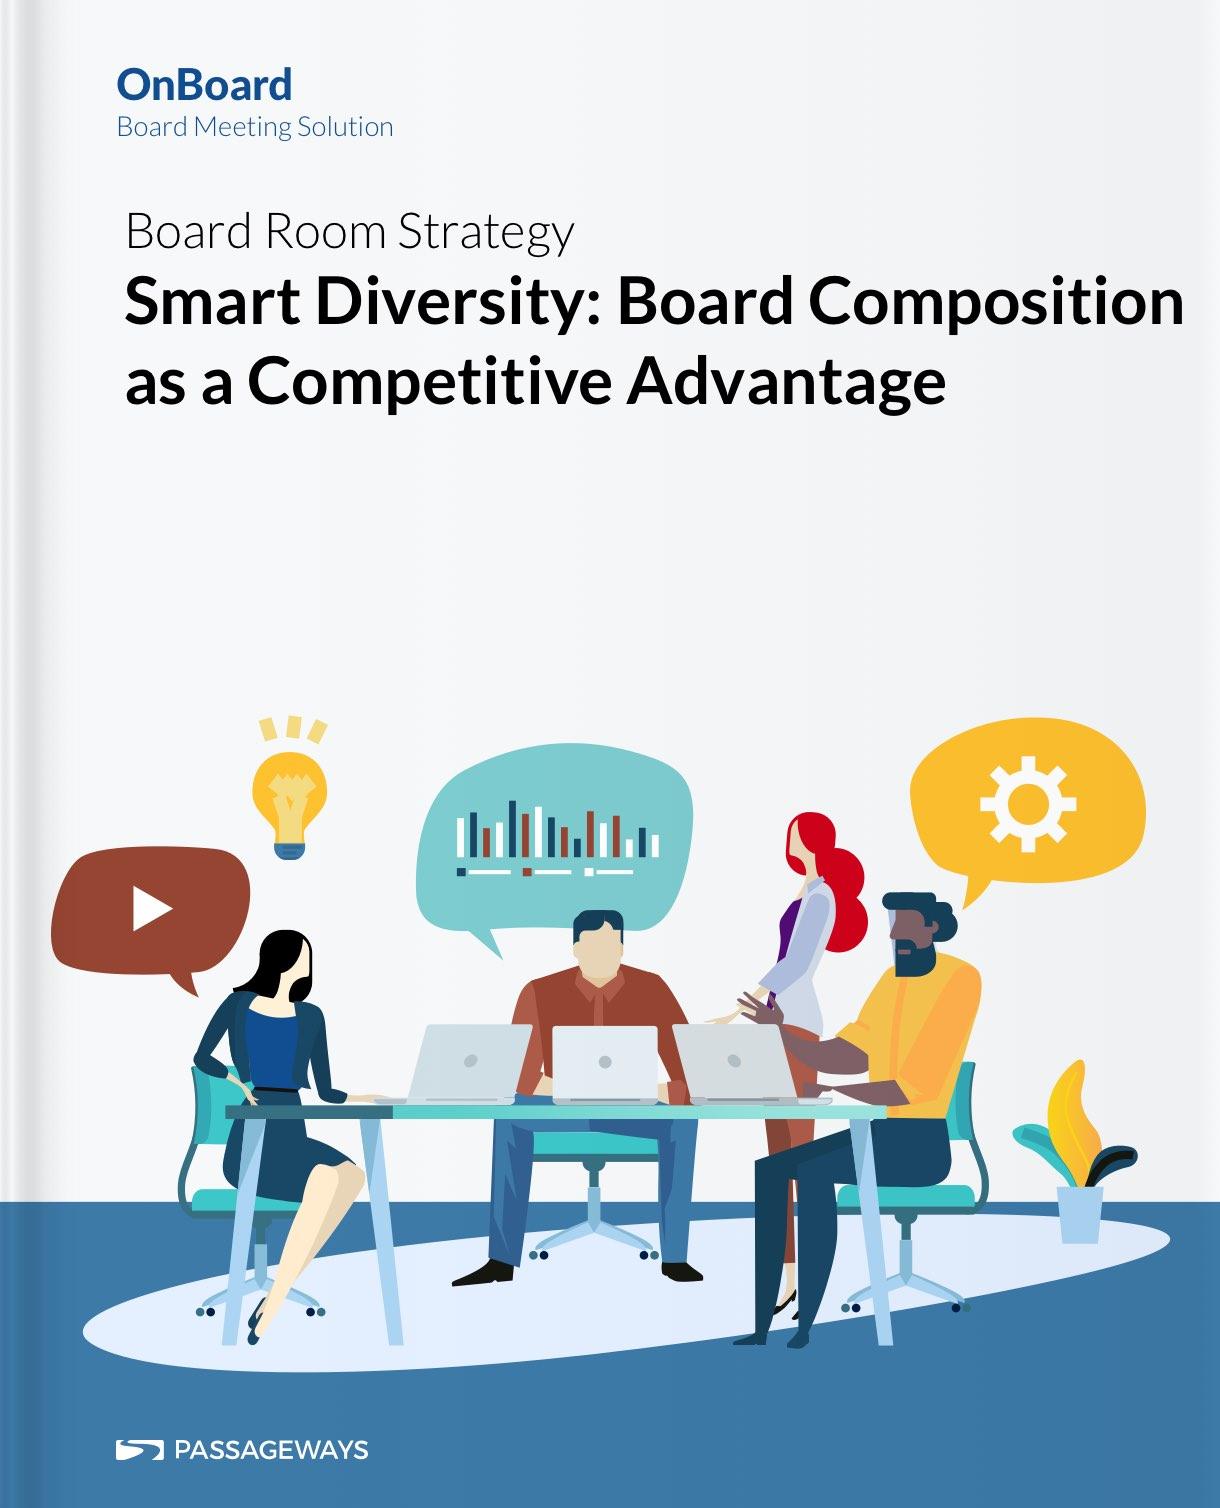 Smart Diversity